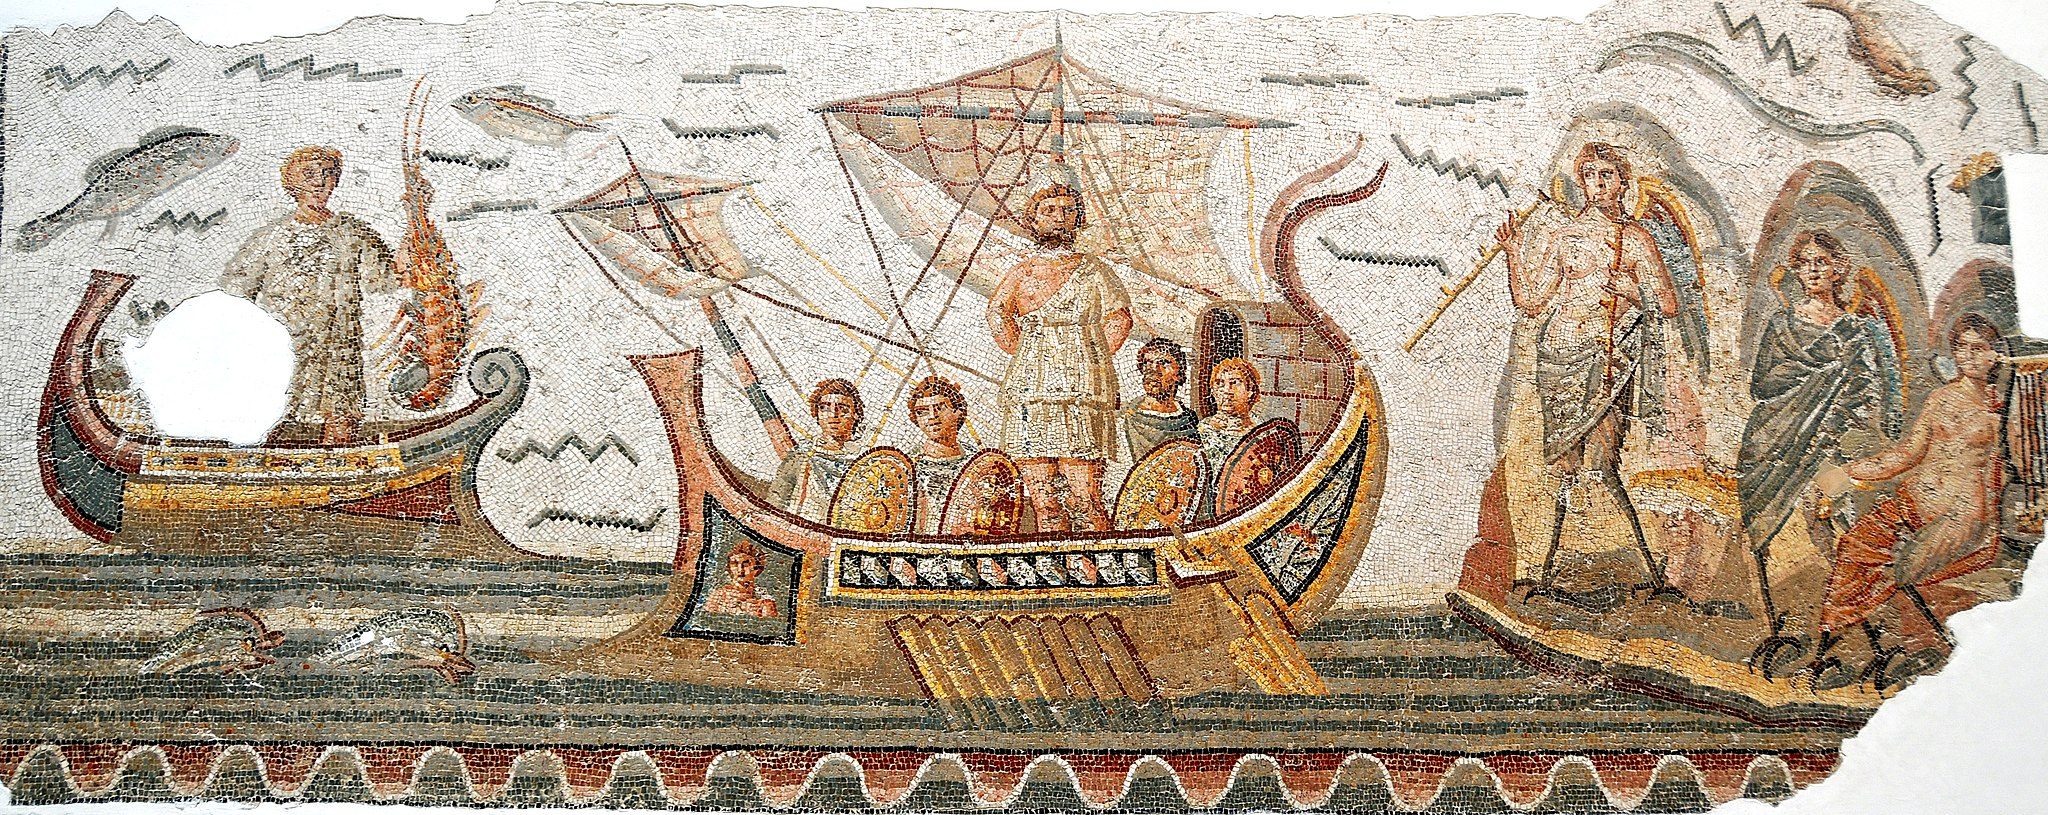 Bardo Mosaic Ulysses